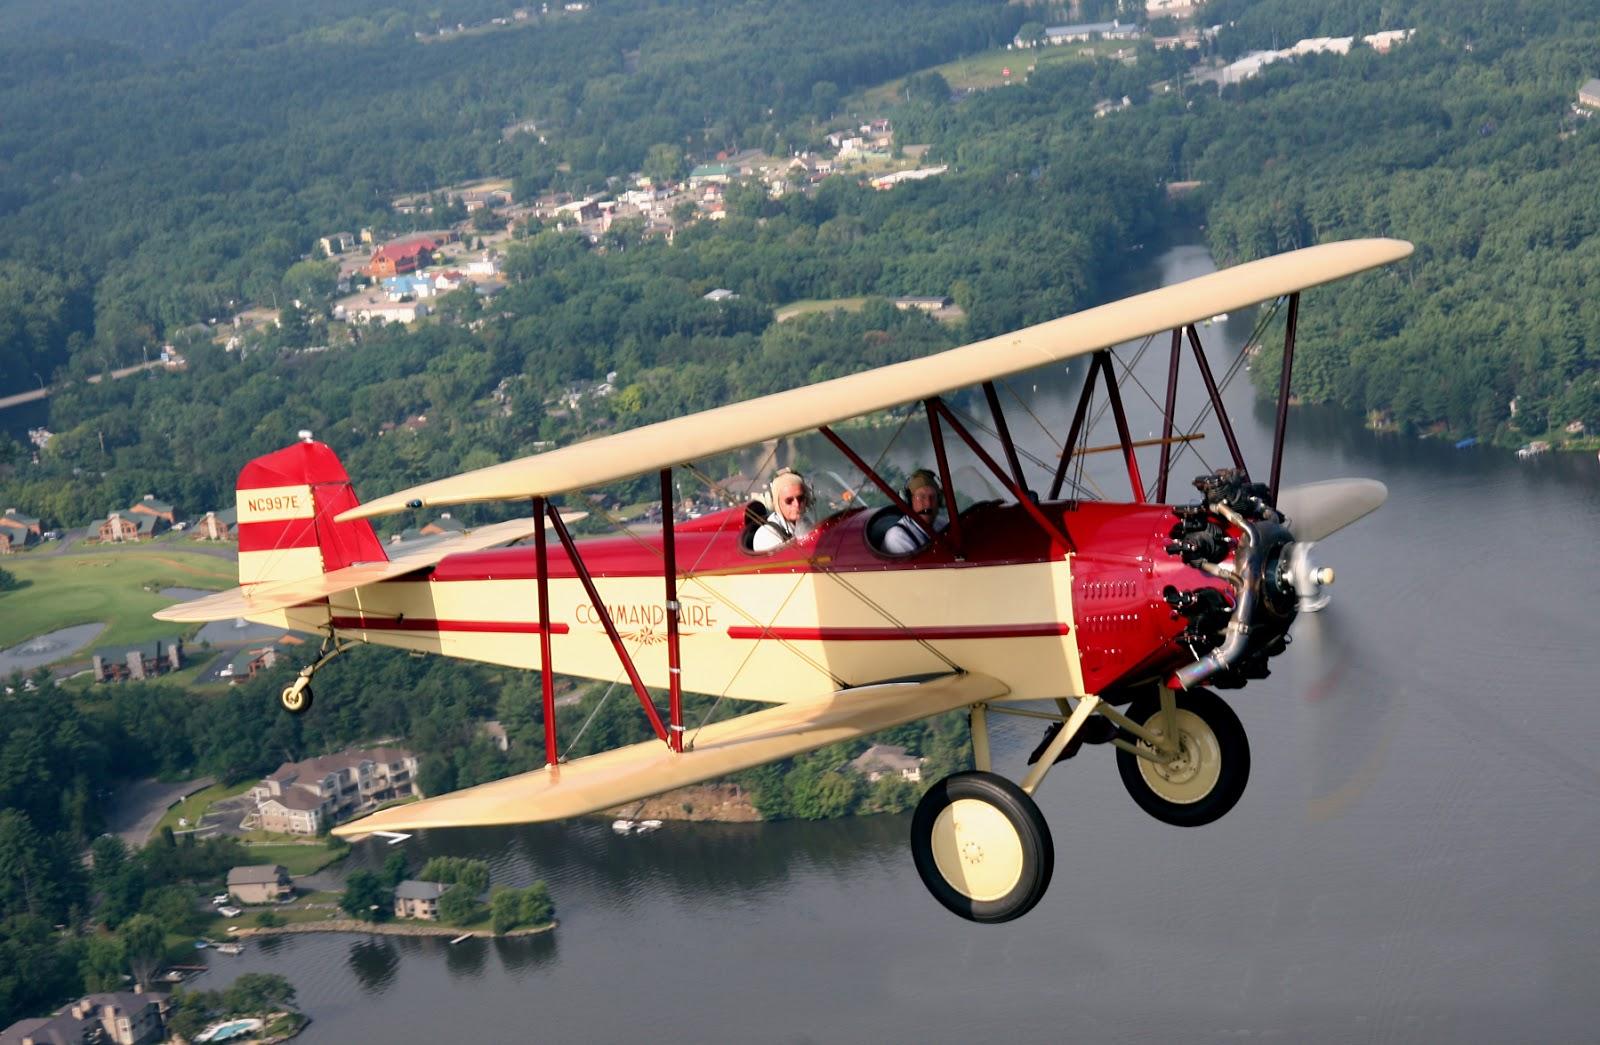 30 Superb Photos Of Vintage Airplanes 24. vintage aircraft ... |Vintage Jet Planes